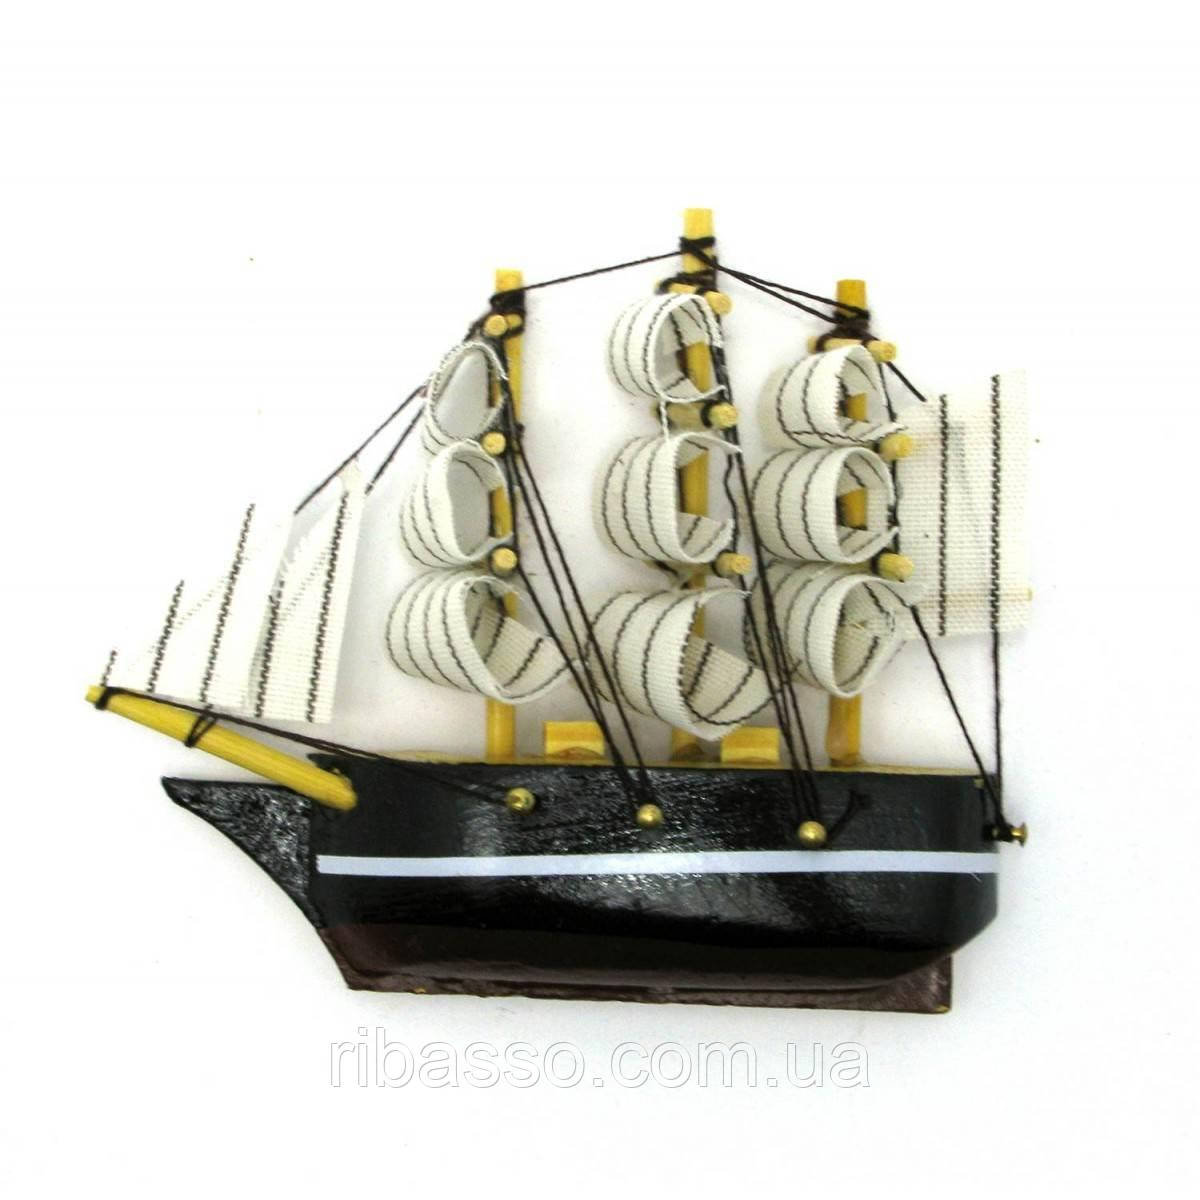 "Магнит ""Корабль"" 9,5х8,5х2 см 28420"